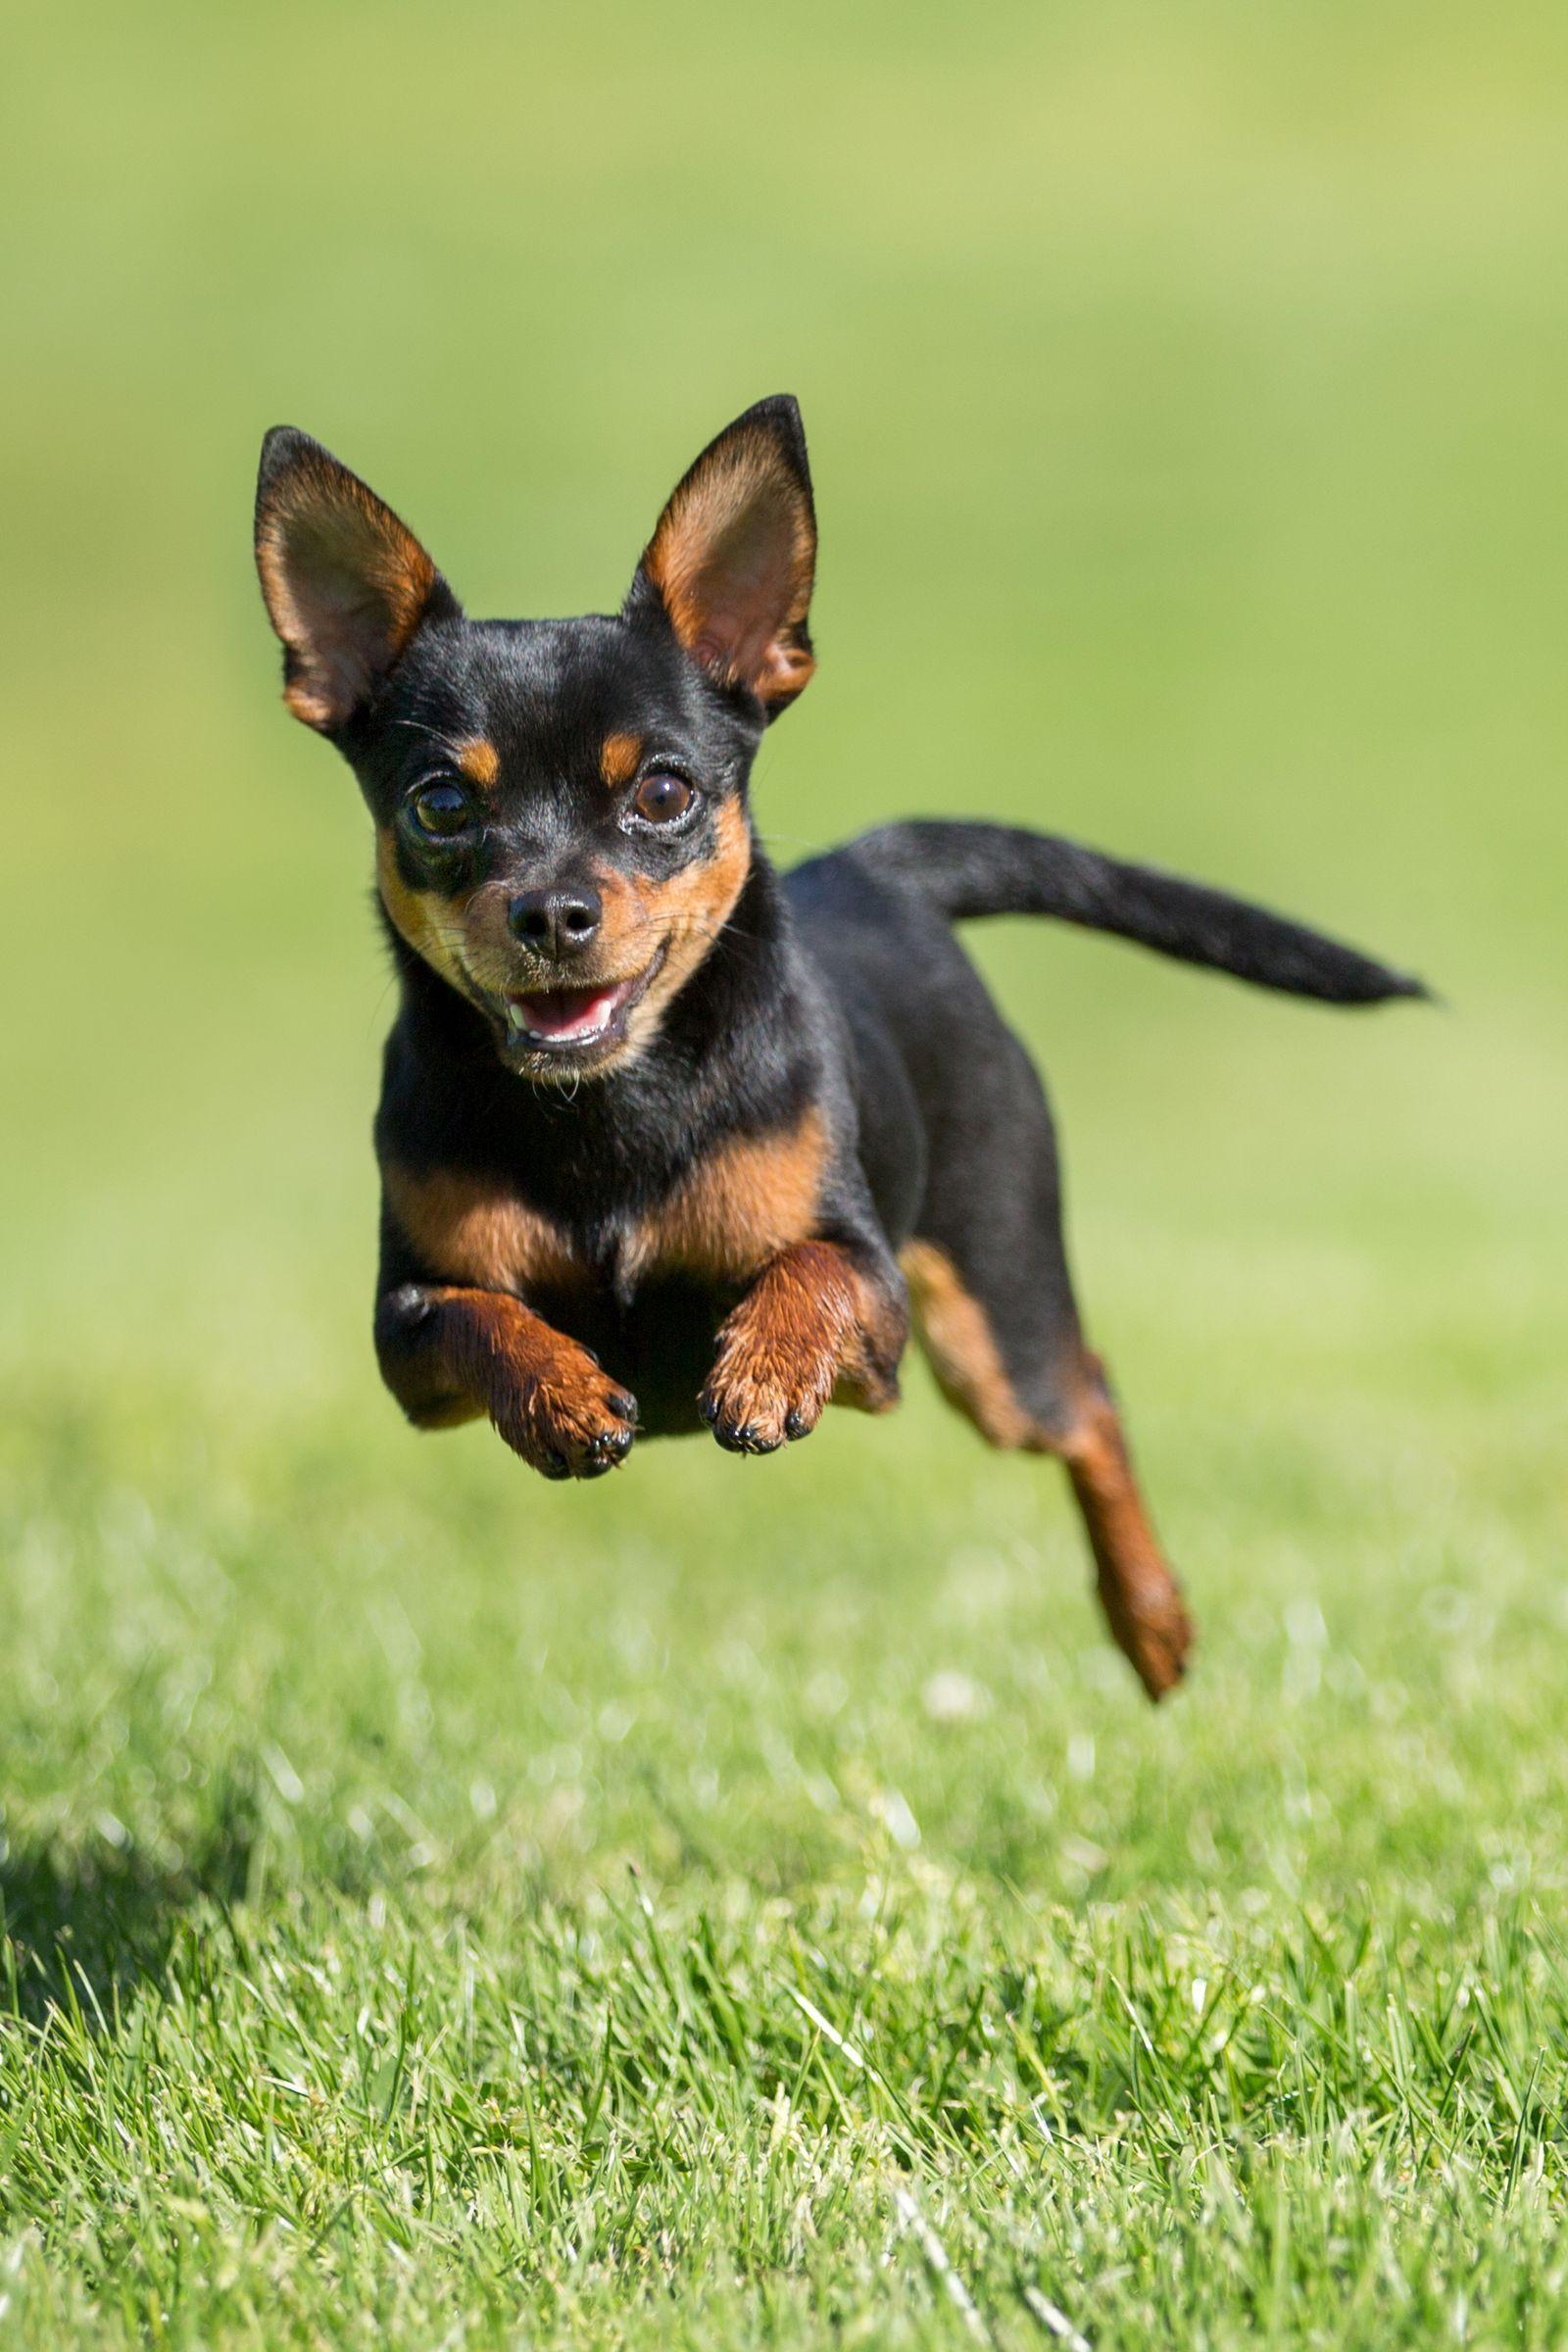 Chihuahua Temperamental Hard To Train Toy Dog Breeds Miniature Dog Breeds Dog Breeds